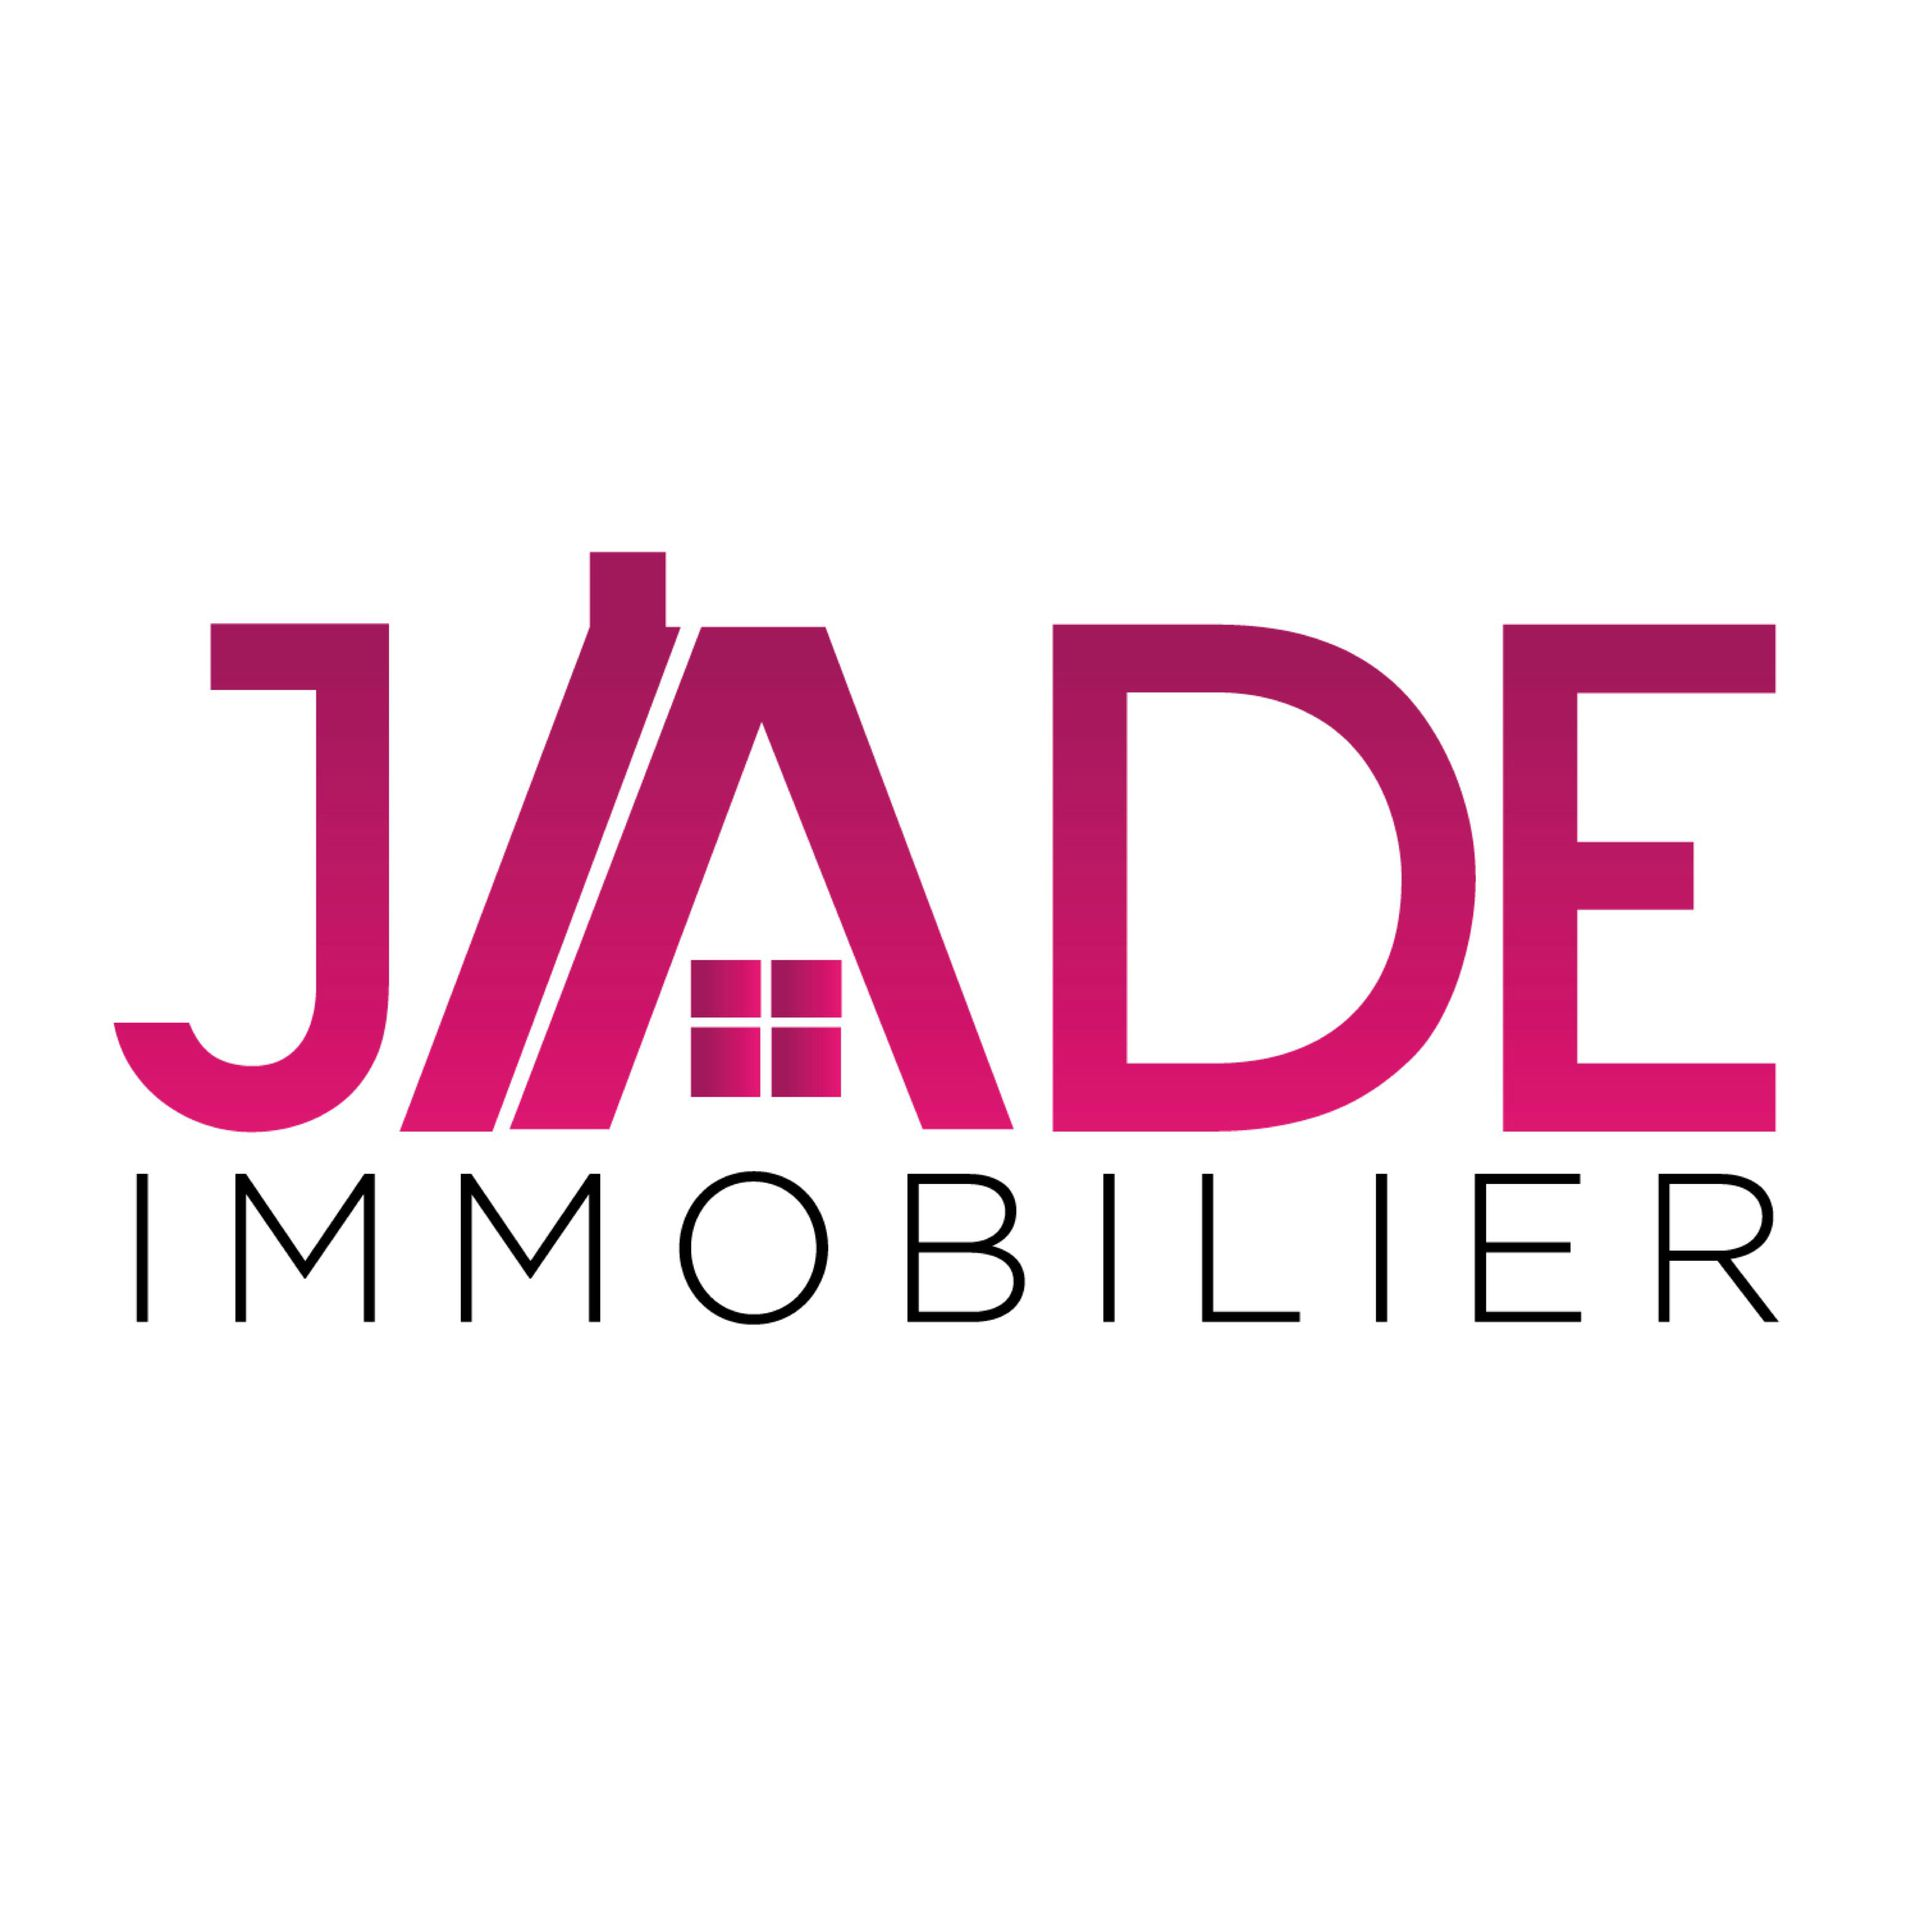 Jade Immobilier agence immobilière